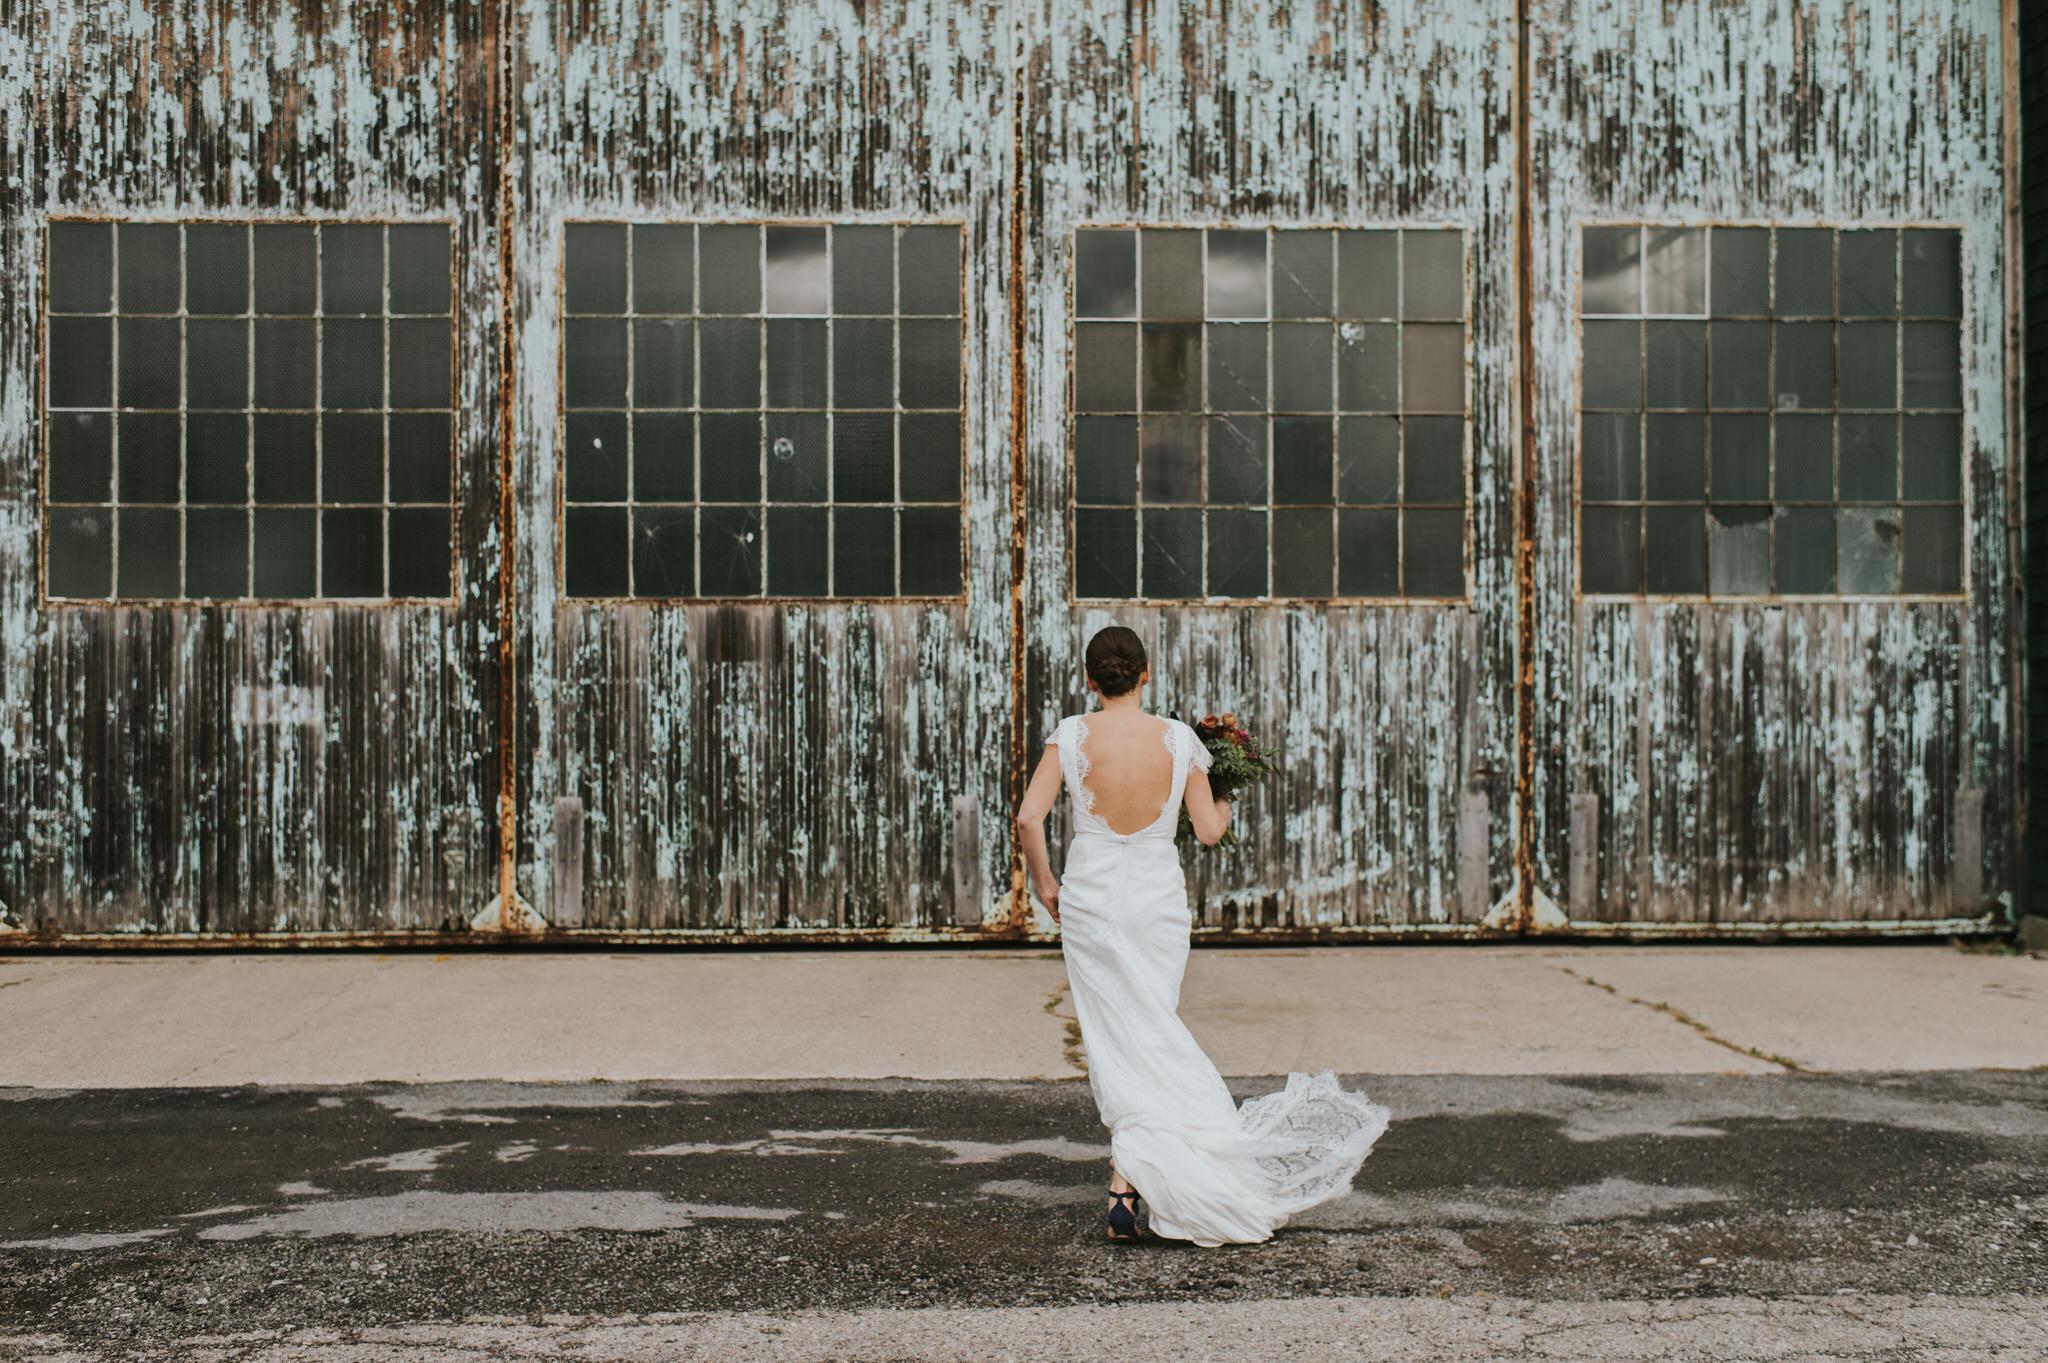 scarletoneillphotography_weddingphotography_prince edward county weddings070.JPG